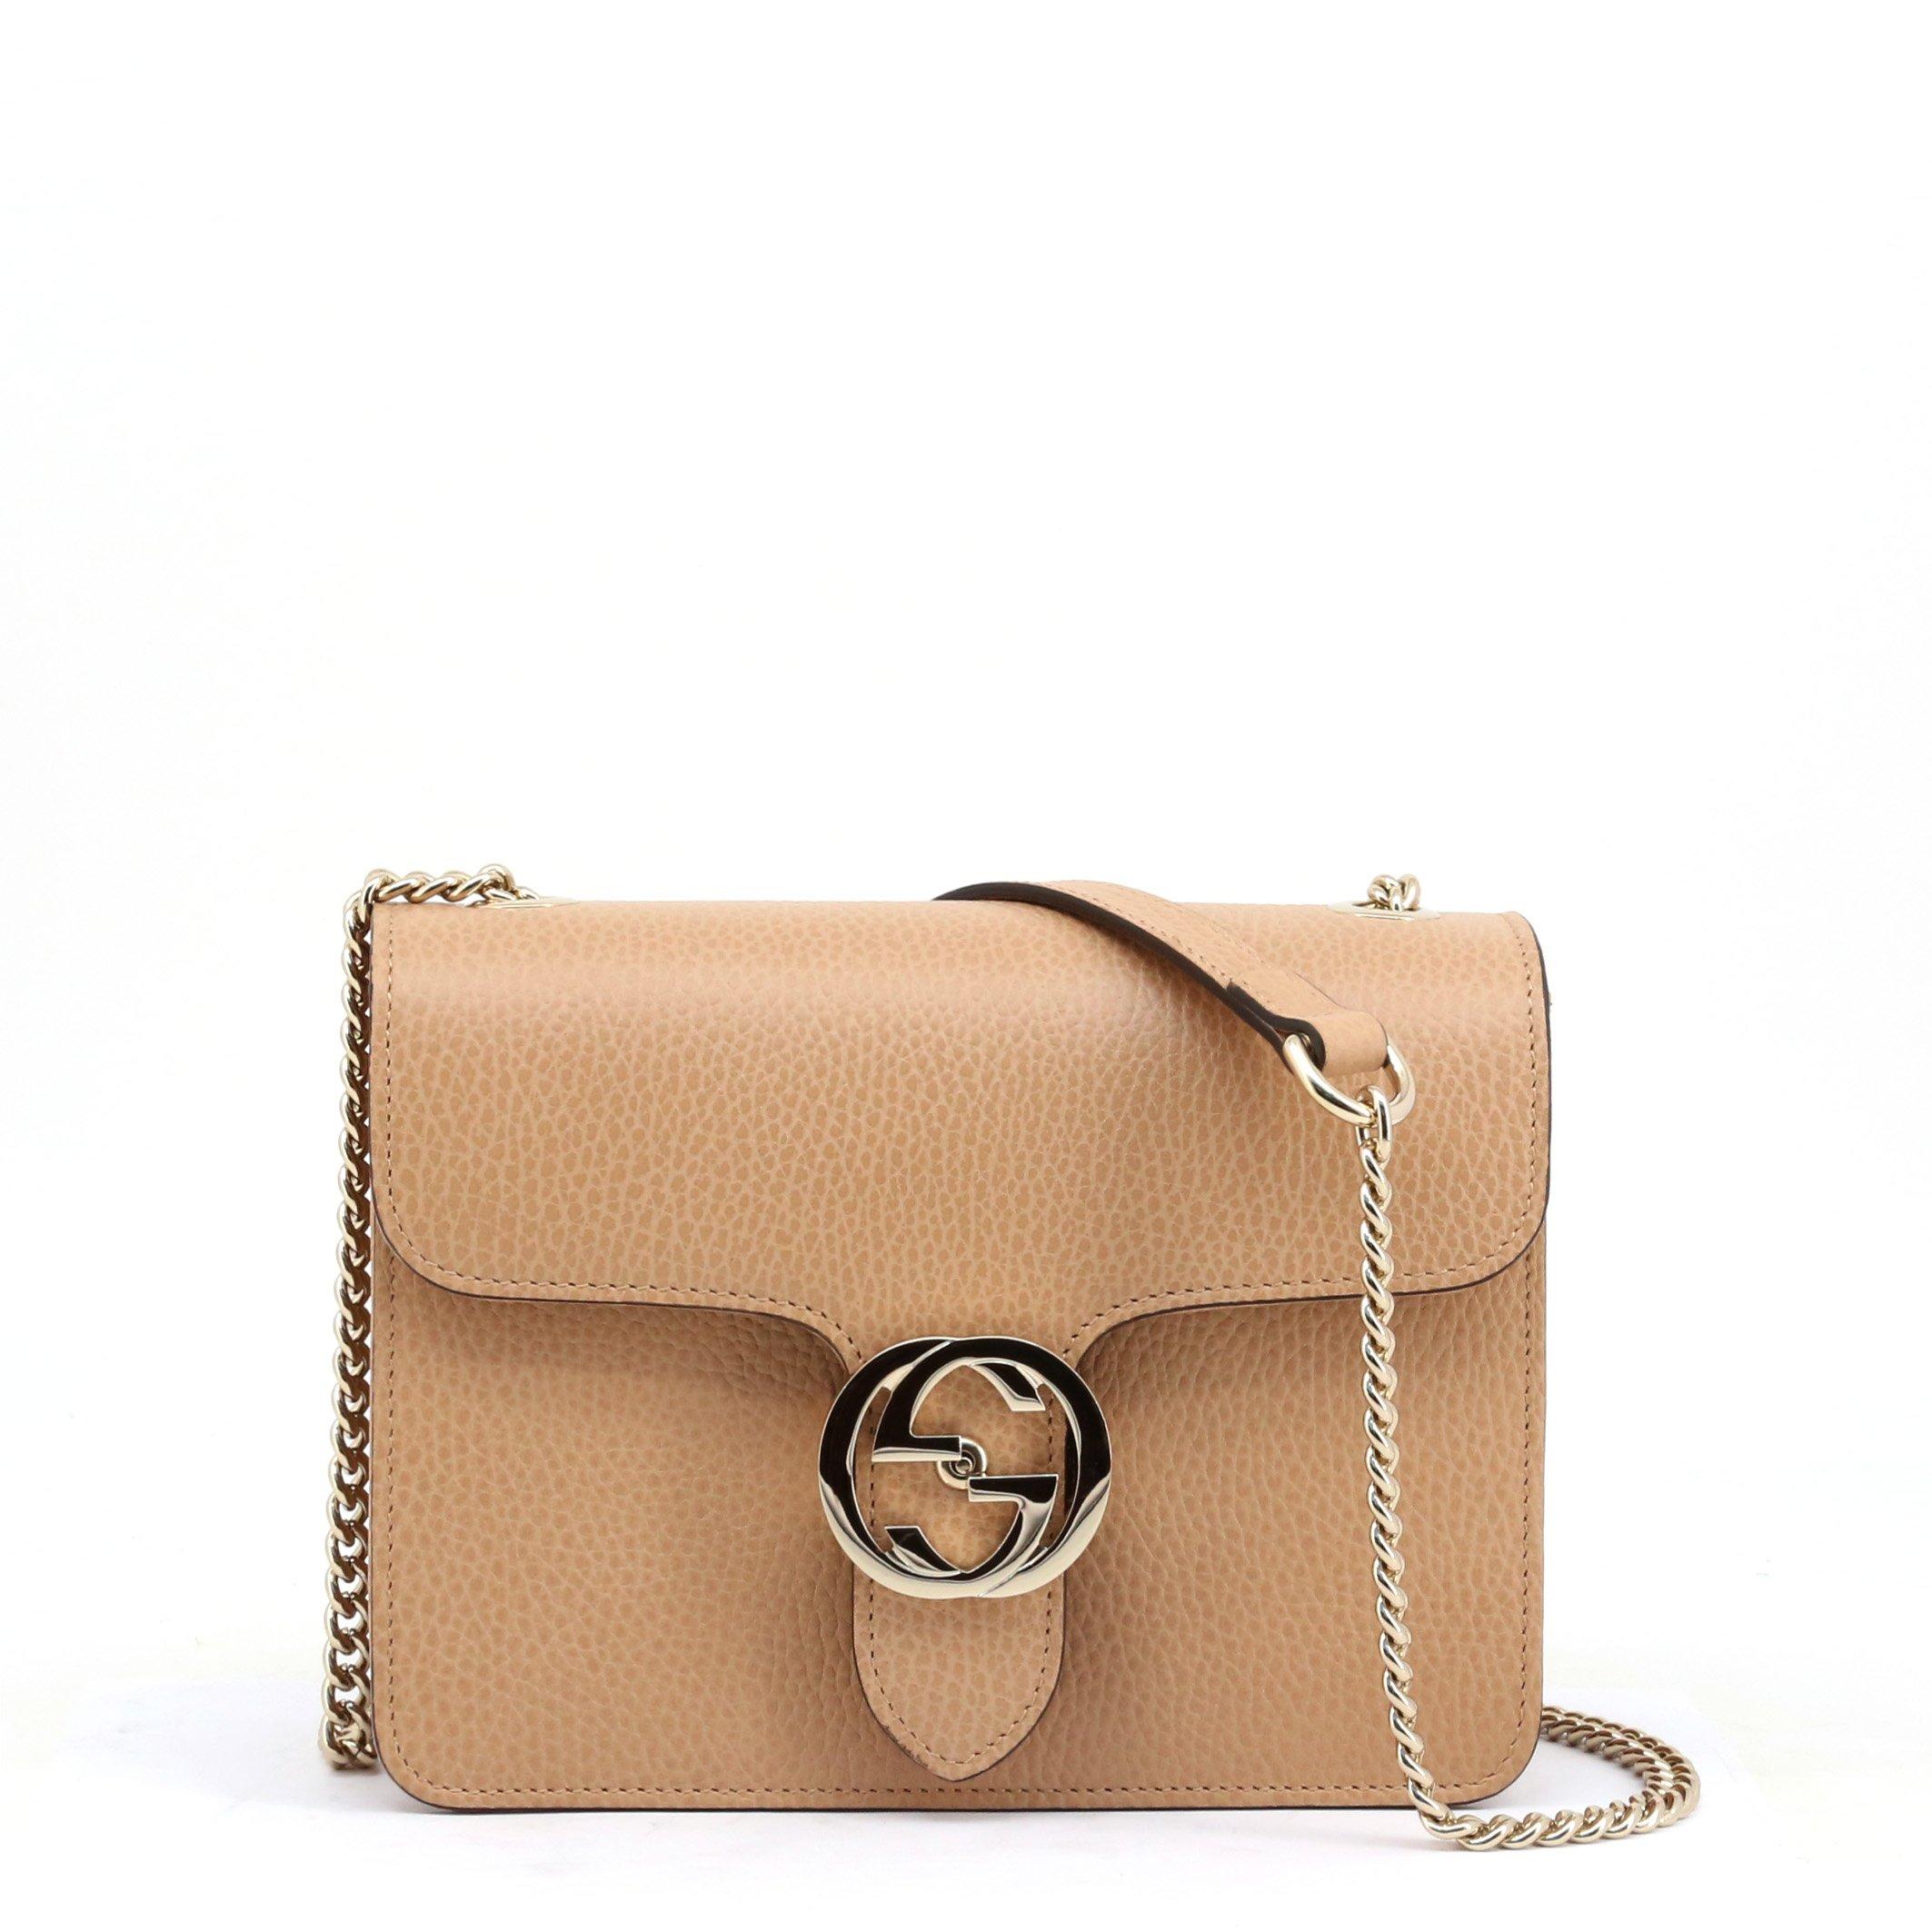 Gucci Women's Crossbody Bag Various Colours 510304_CA00G - brown NOSIZE